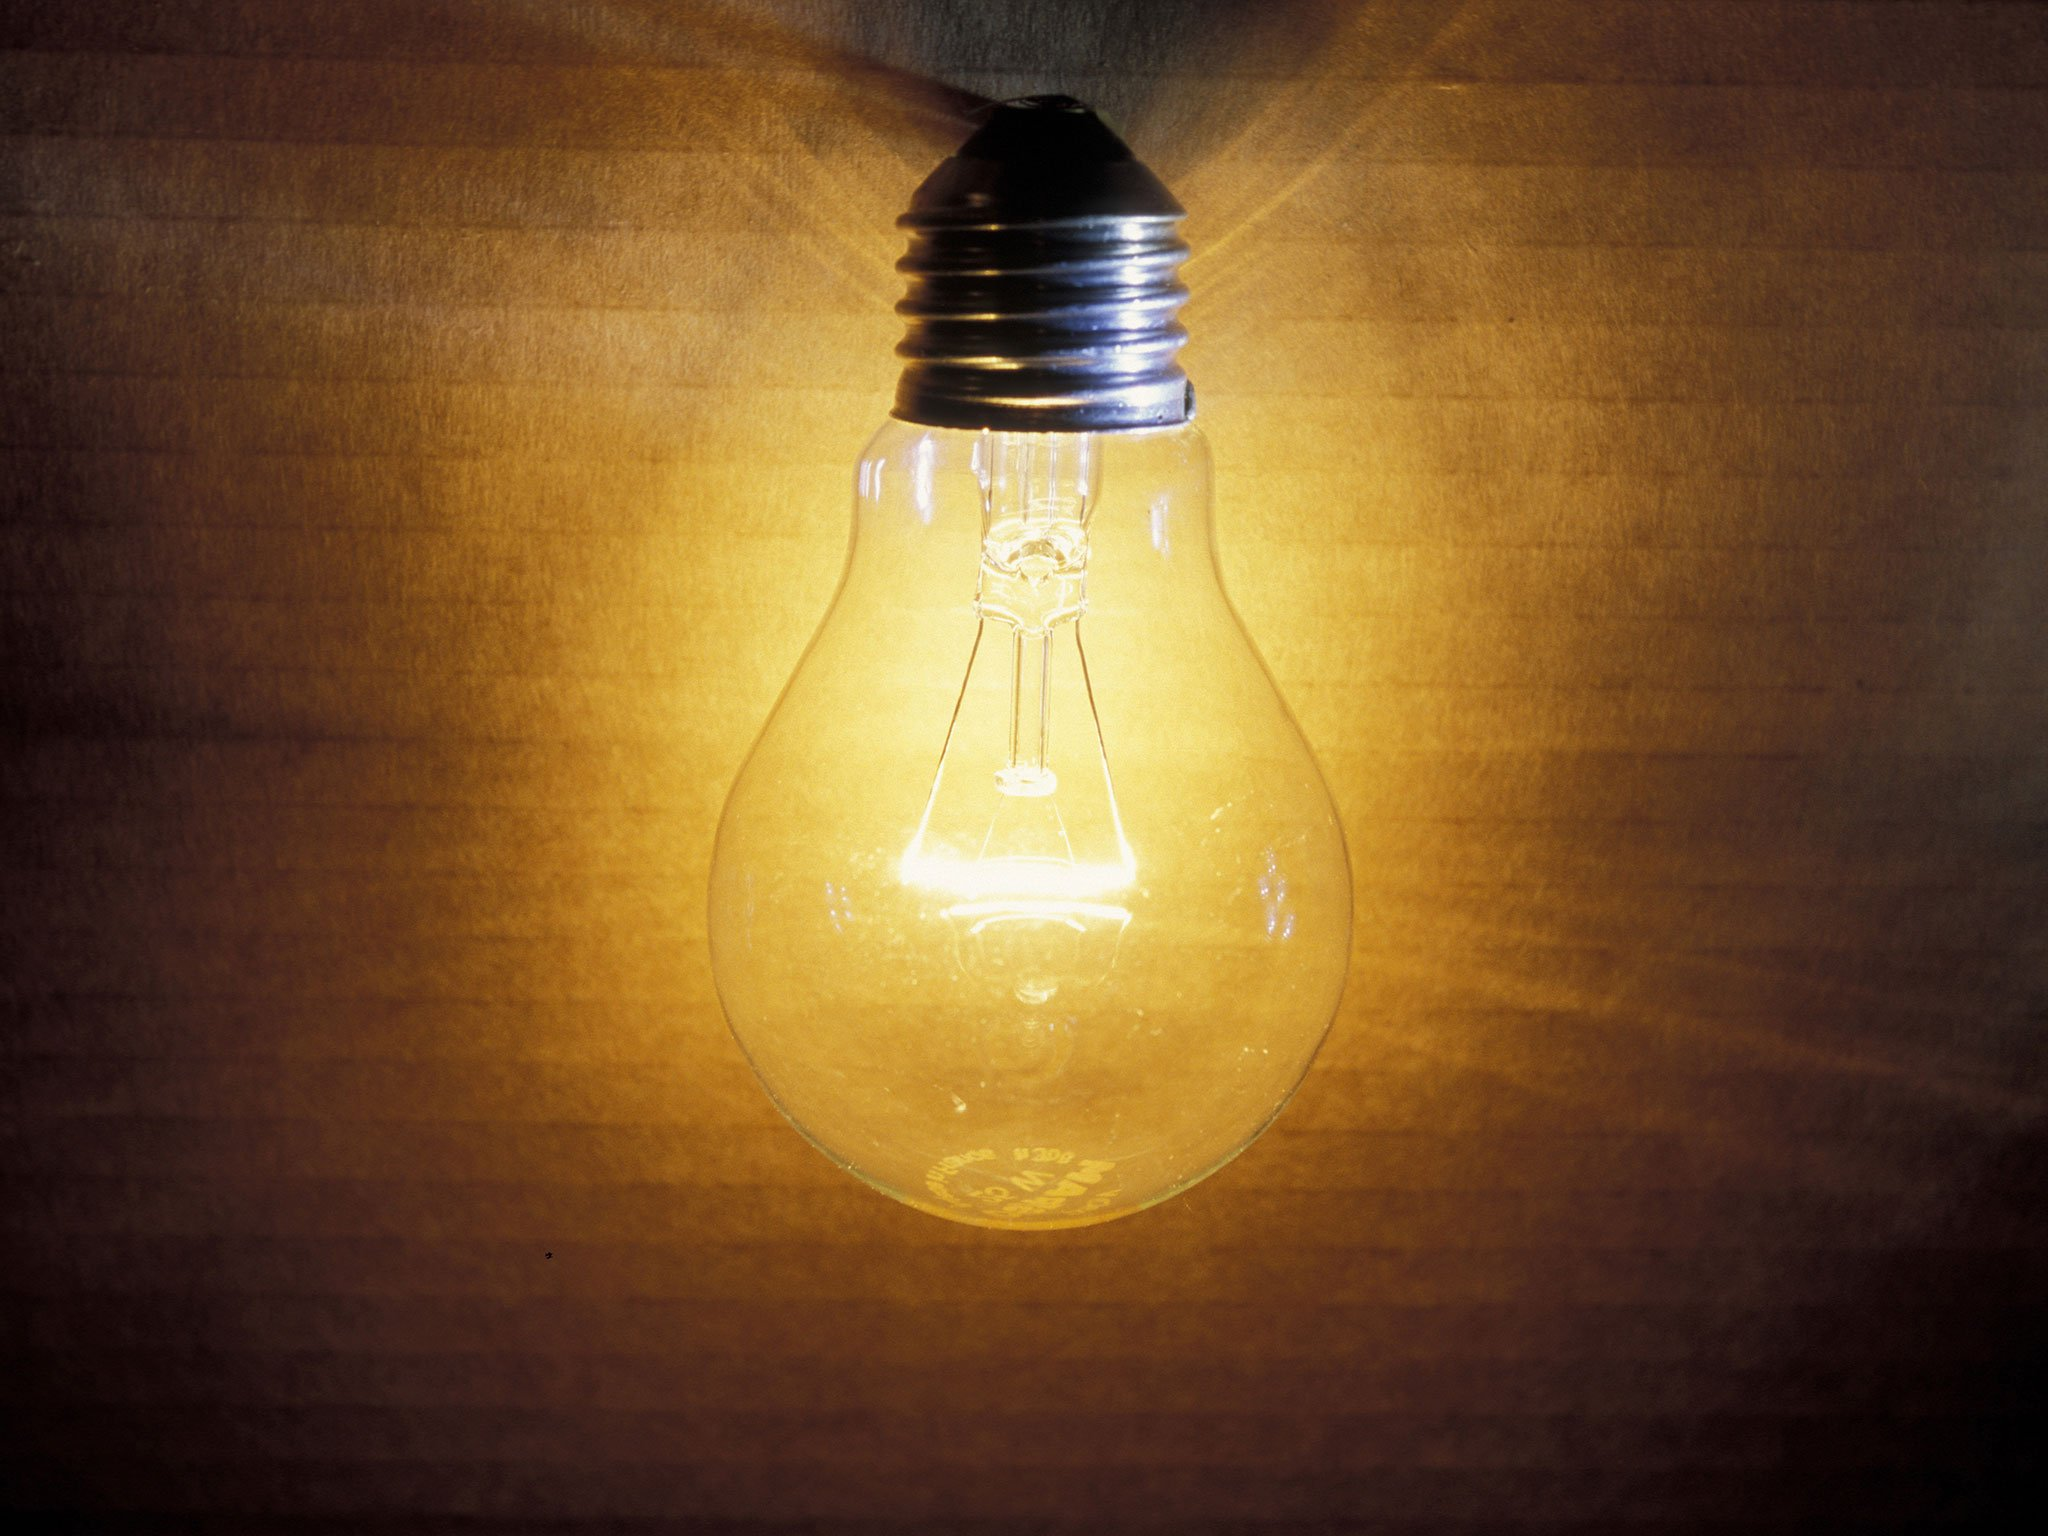 Unique Old Light Bulbs - hypermallapartments